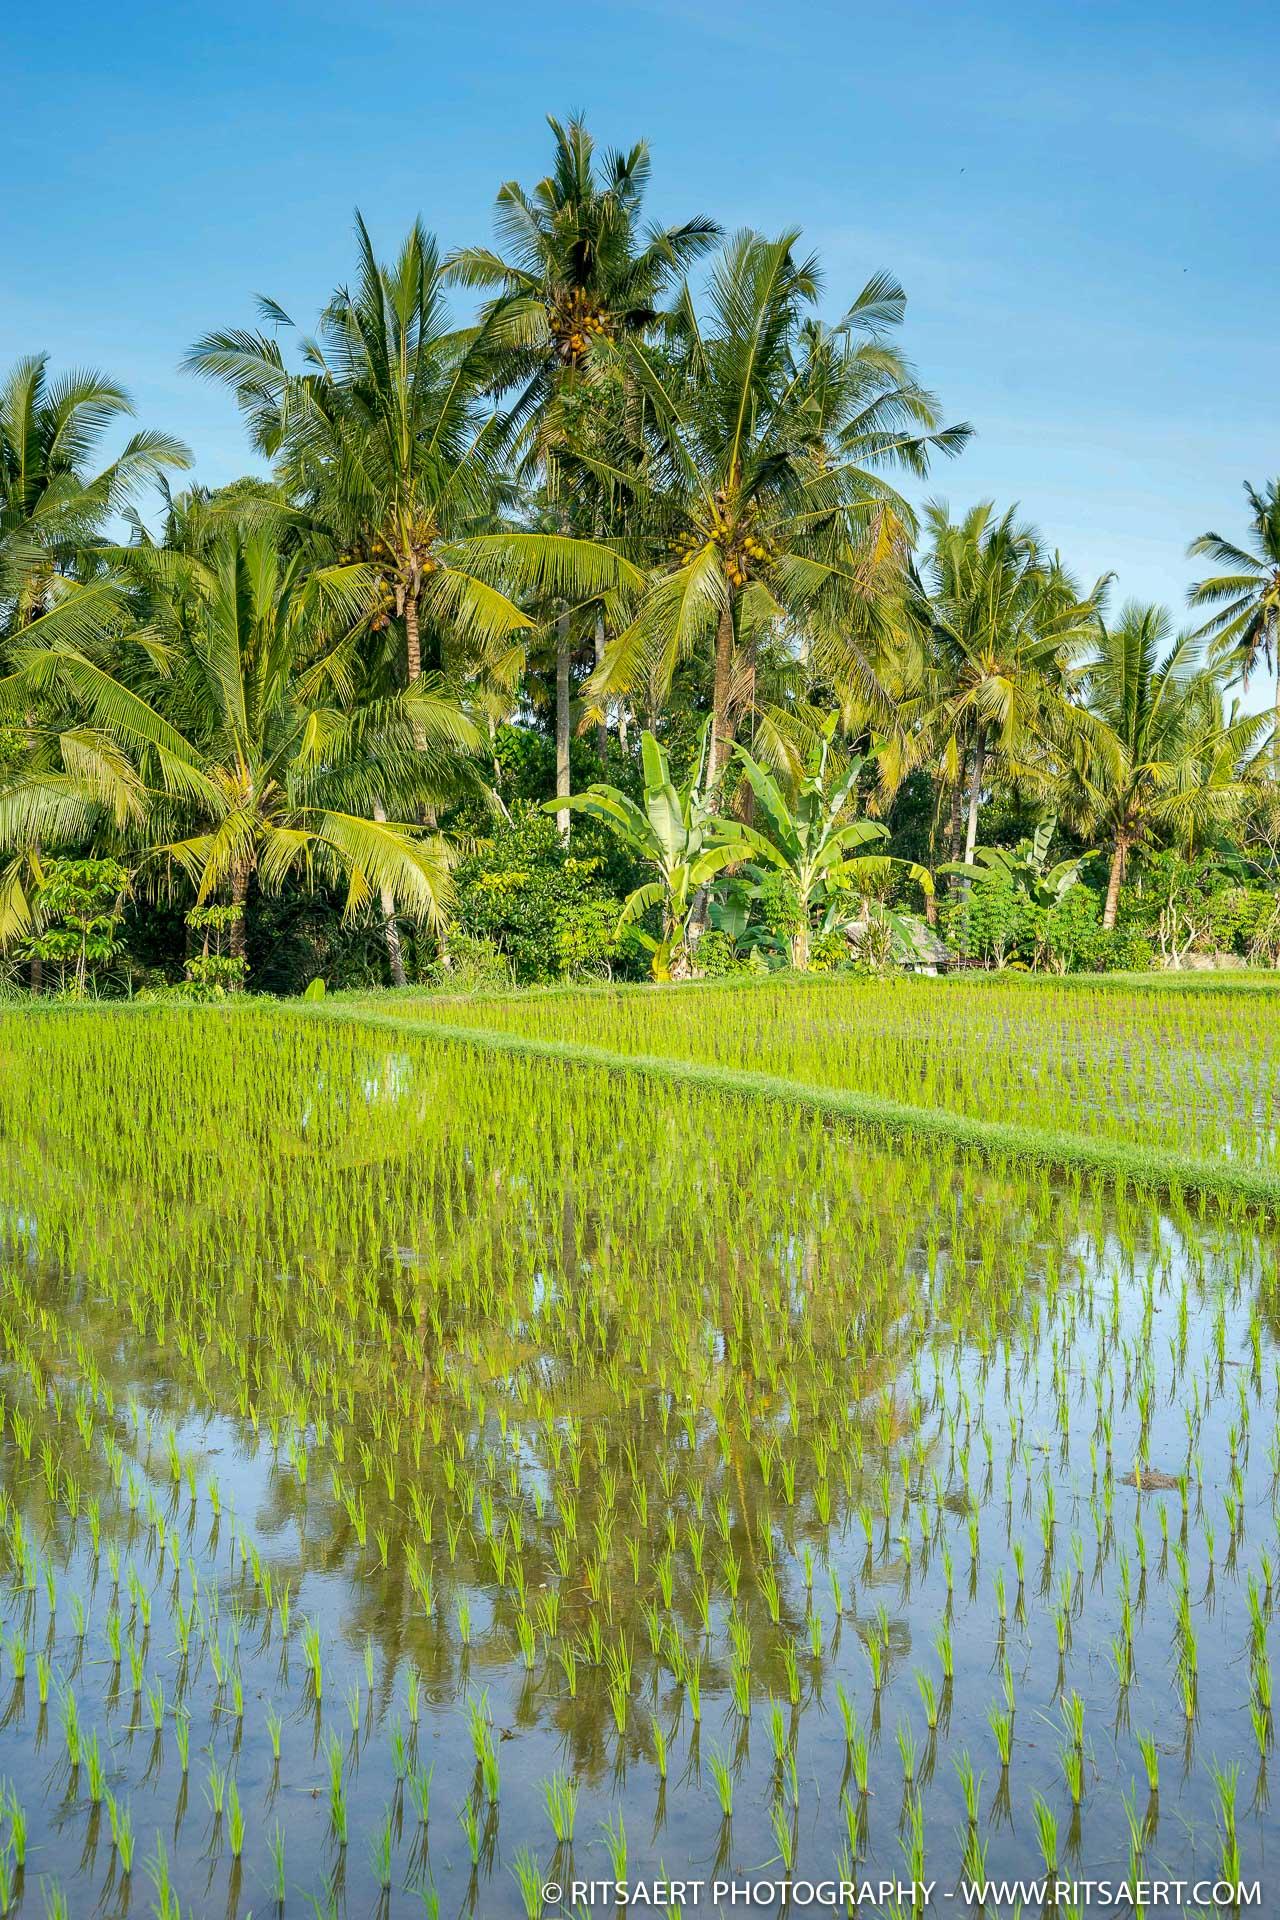 Growing the rice - Bali - Indonesia